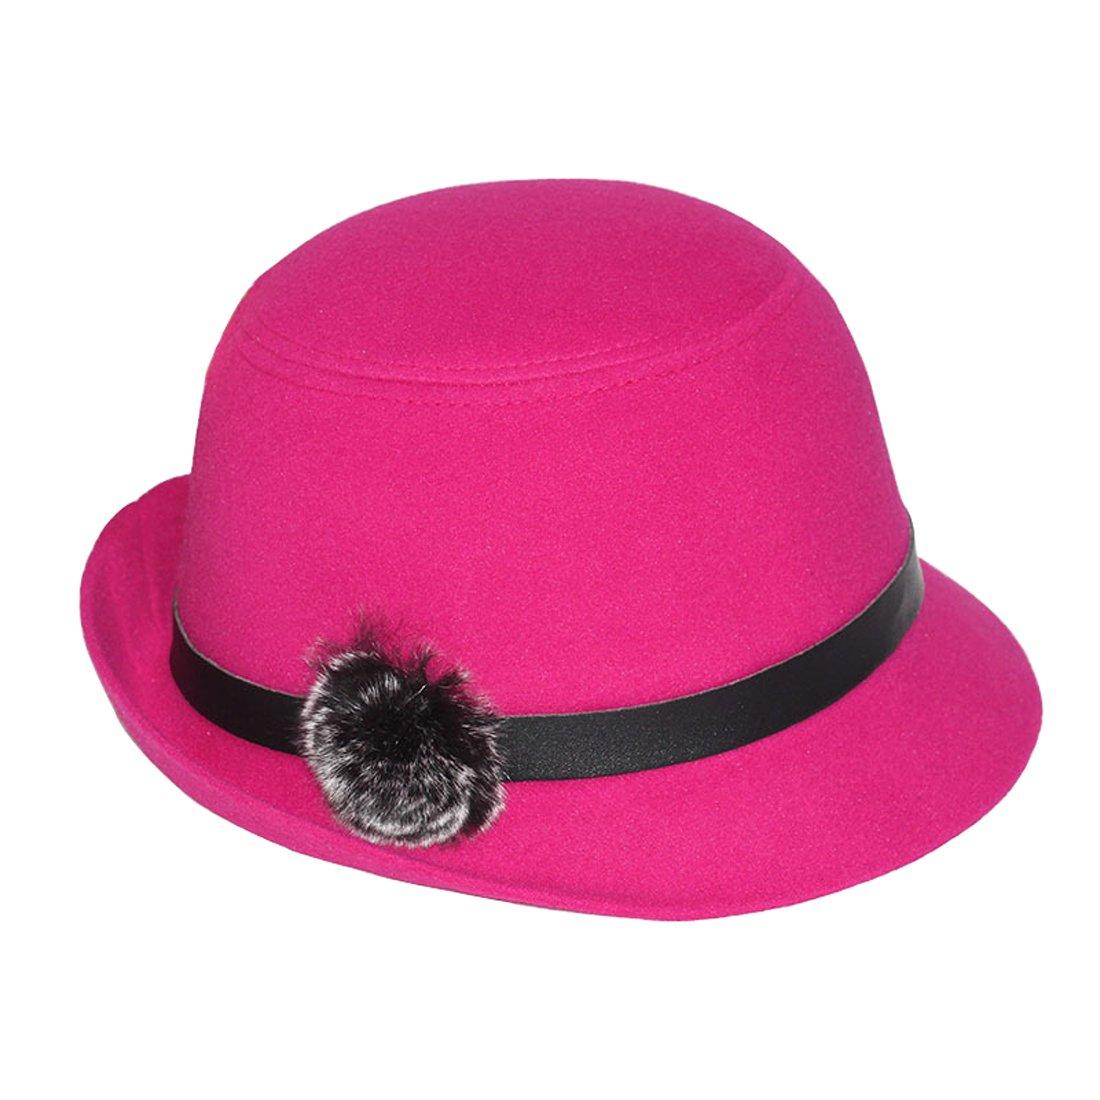 THENICE Damen Mode Hut Filz Melone Bowler Hats Erwachsene